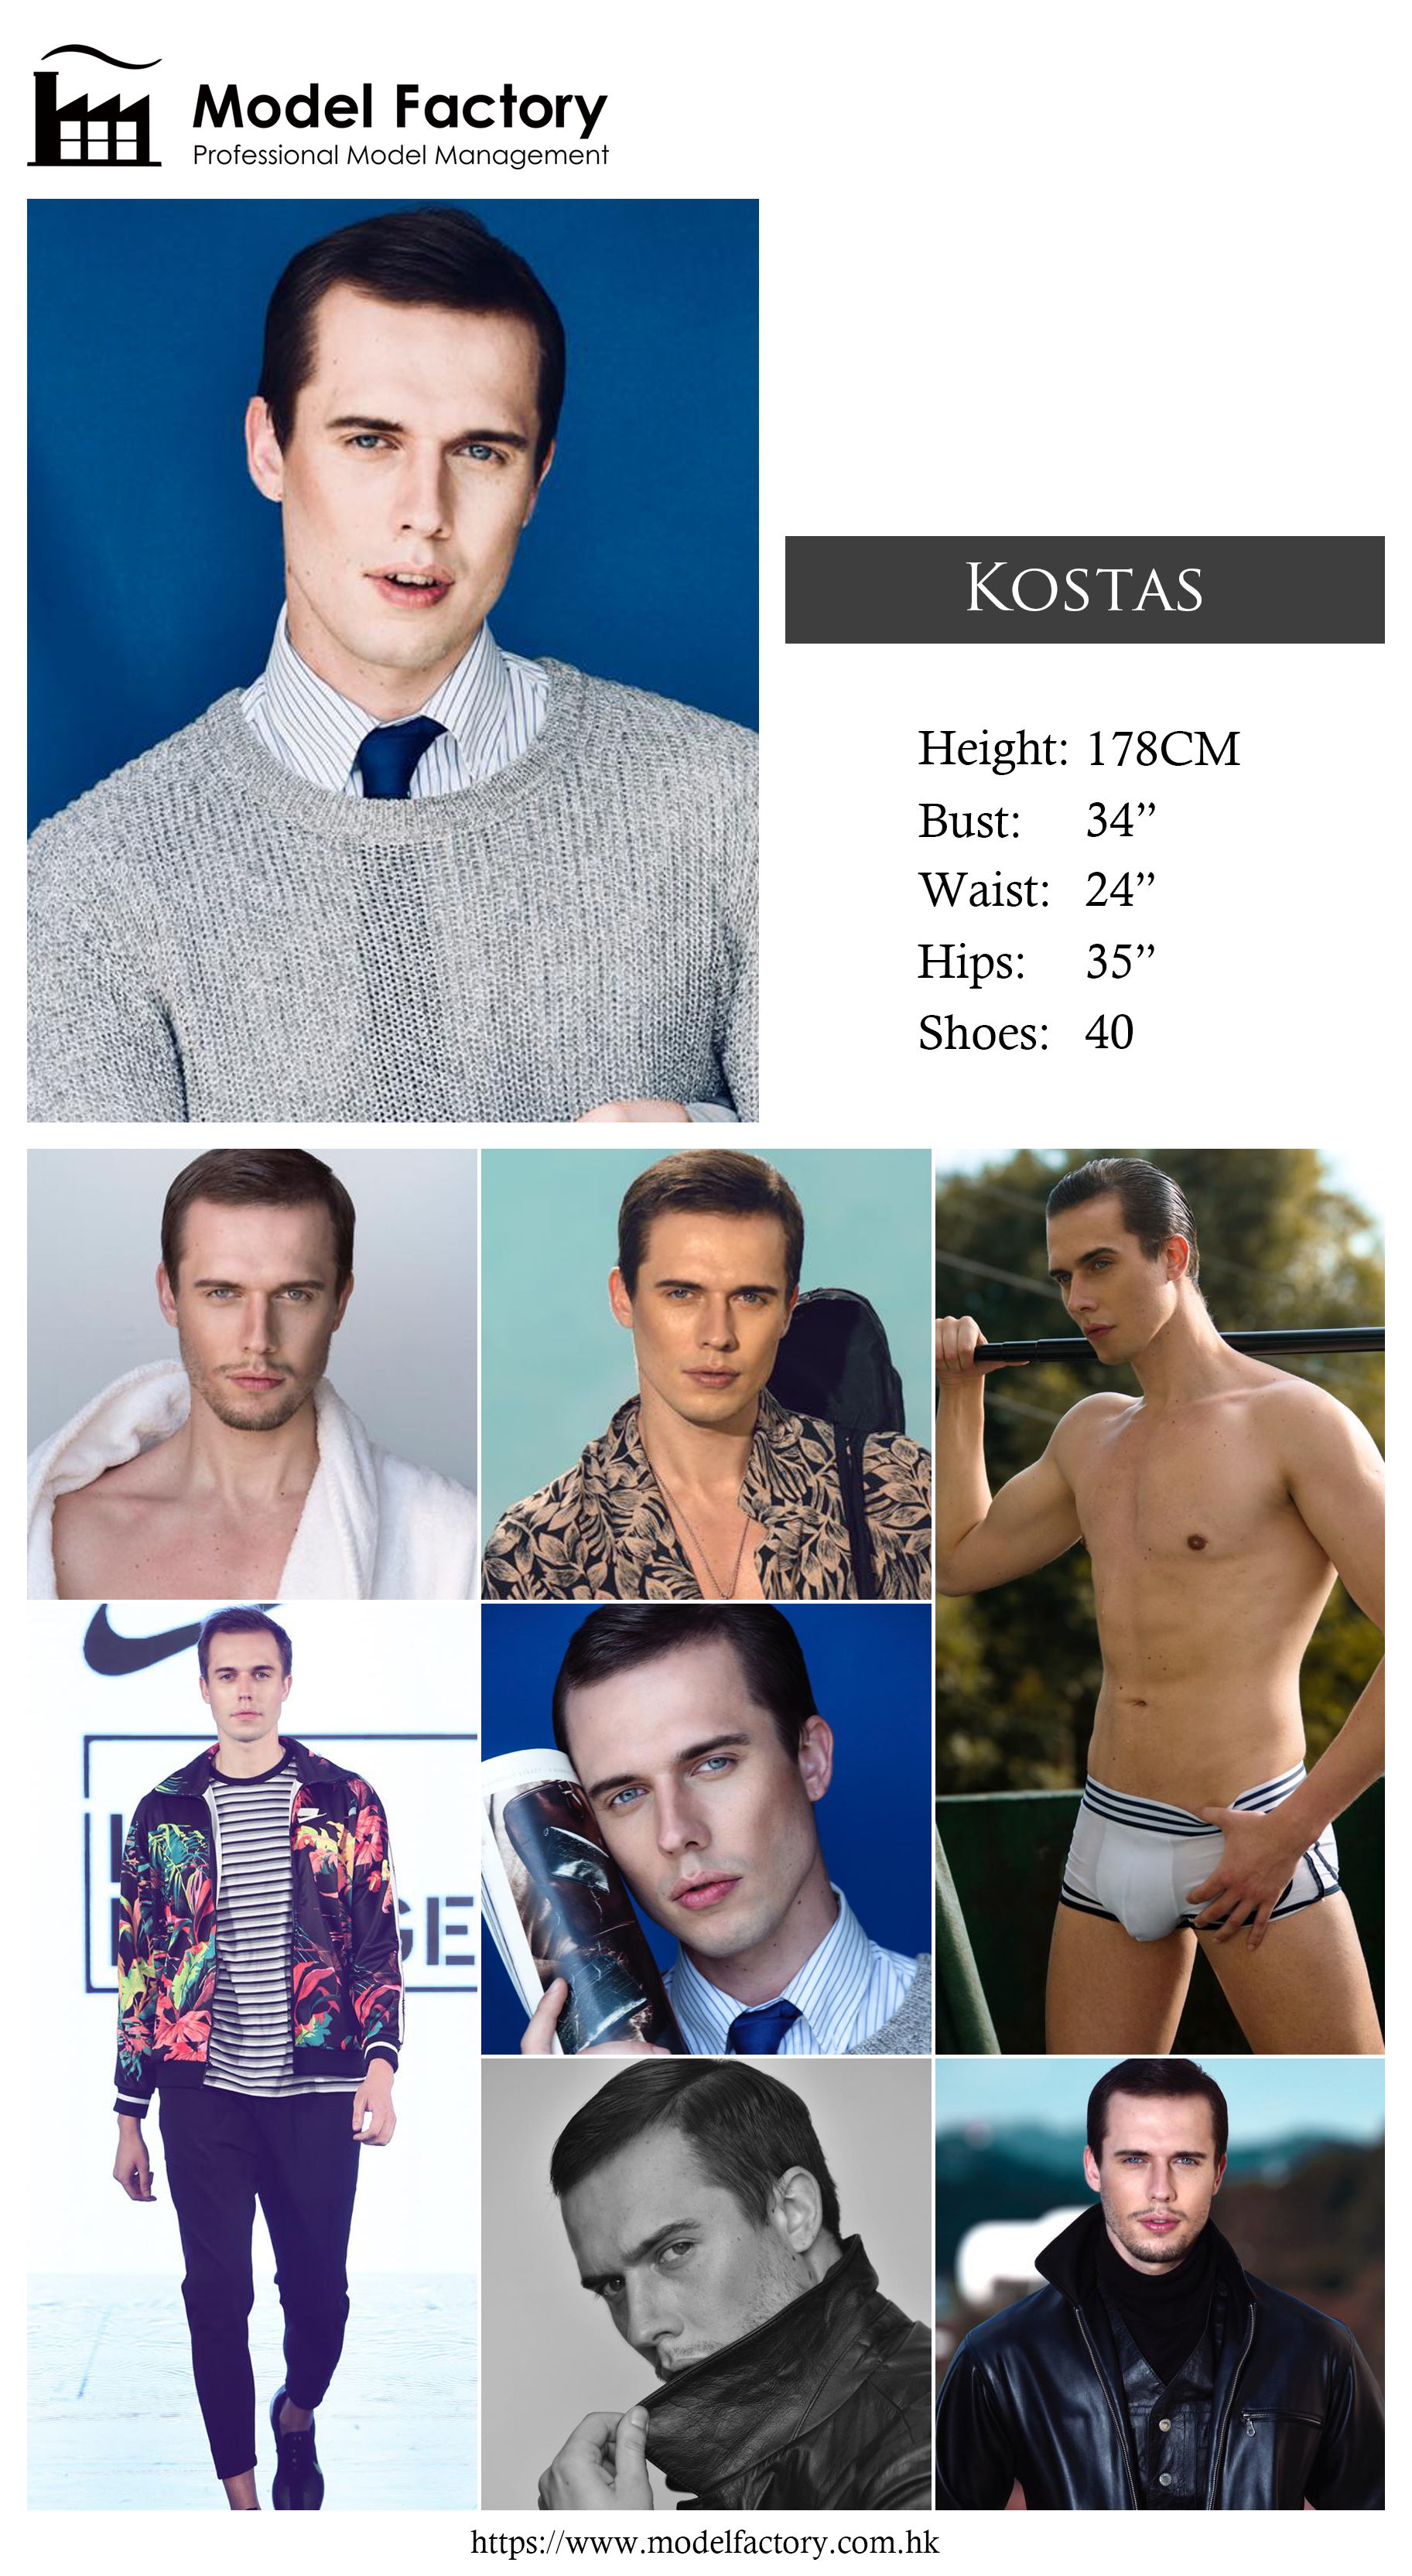 Model Factory Caucasian Male Model Kostas